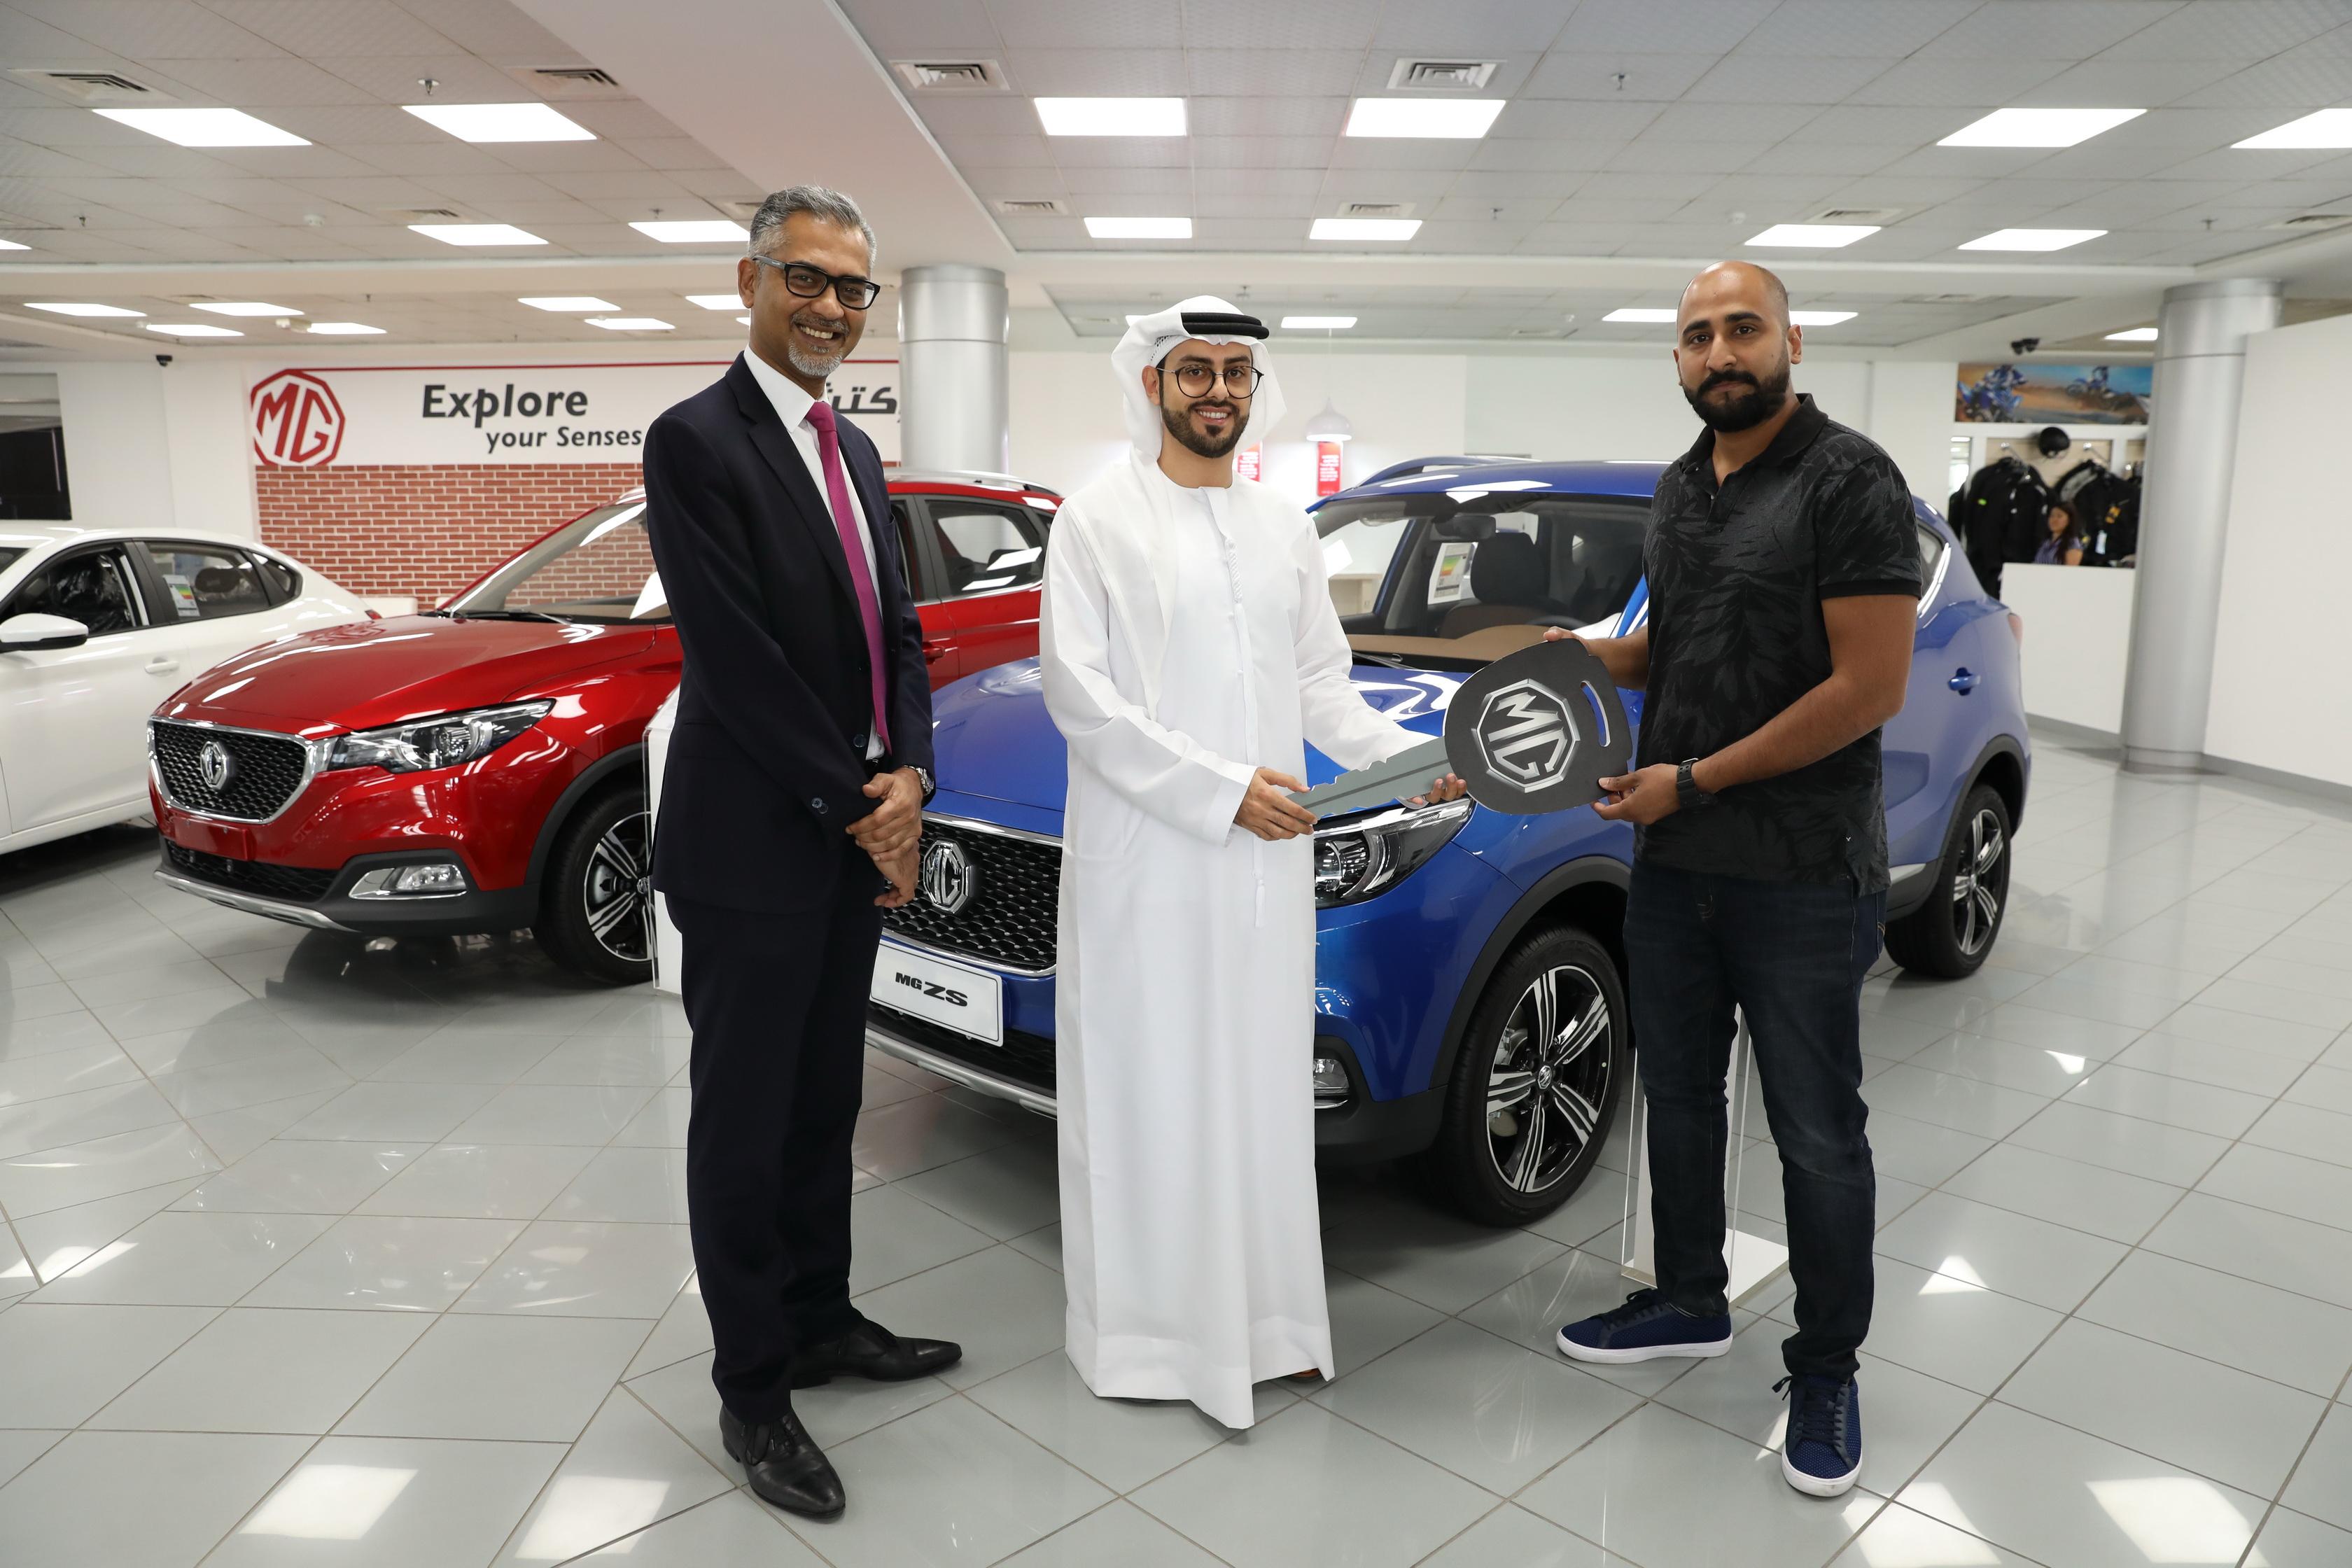 Kuwaiti Winner Drives Away with MG ZS at Gitex Shopper